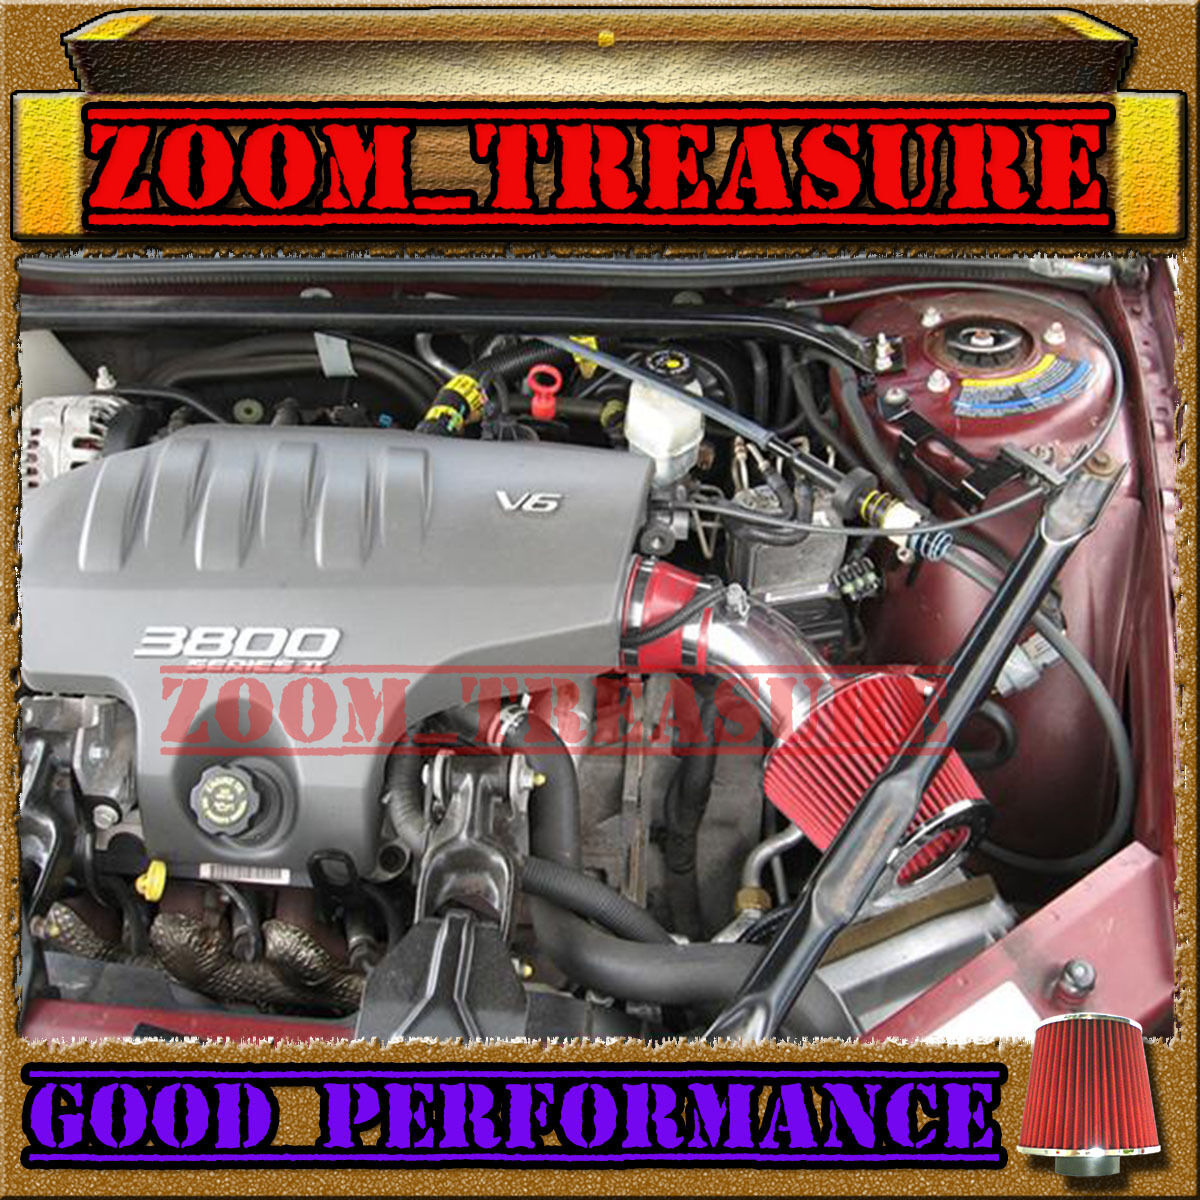 RED 1997-2005 97-05 CHEVY MONTE CARLO PONTIAC GRAND PRIX 3.8L V6 AIR INTAKE KIT